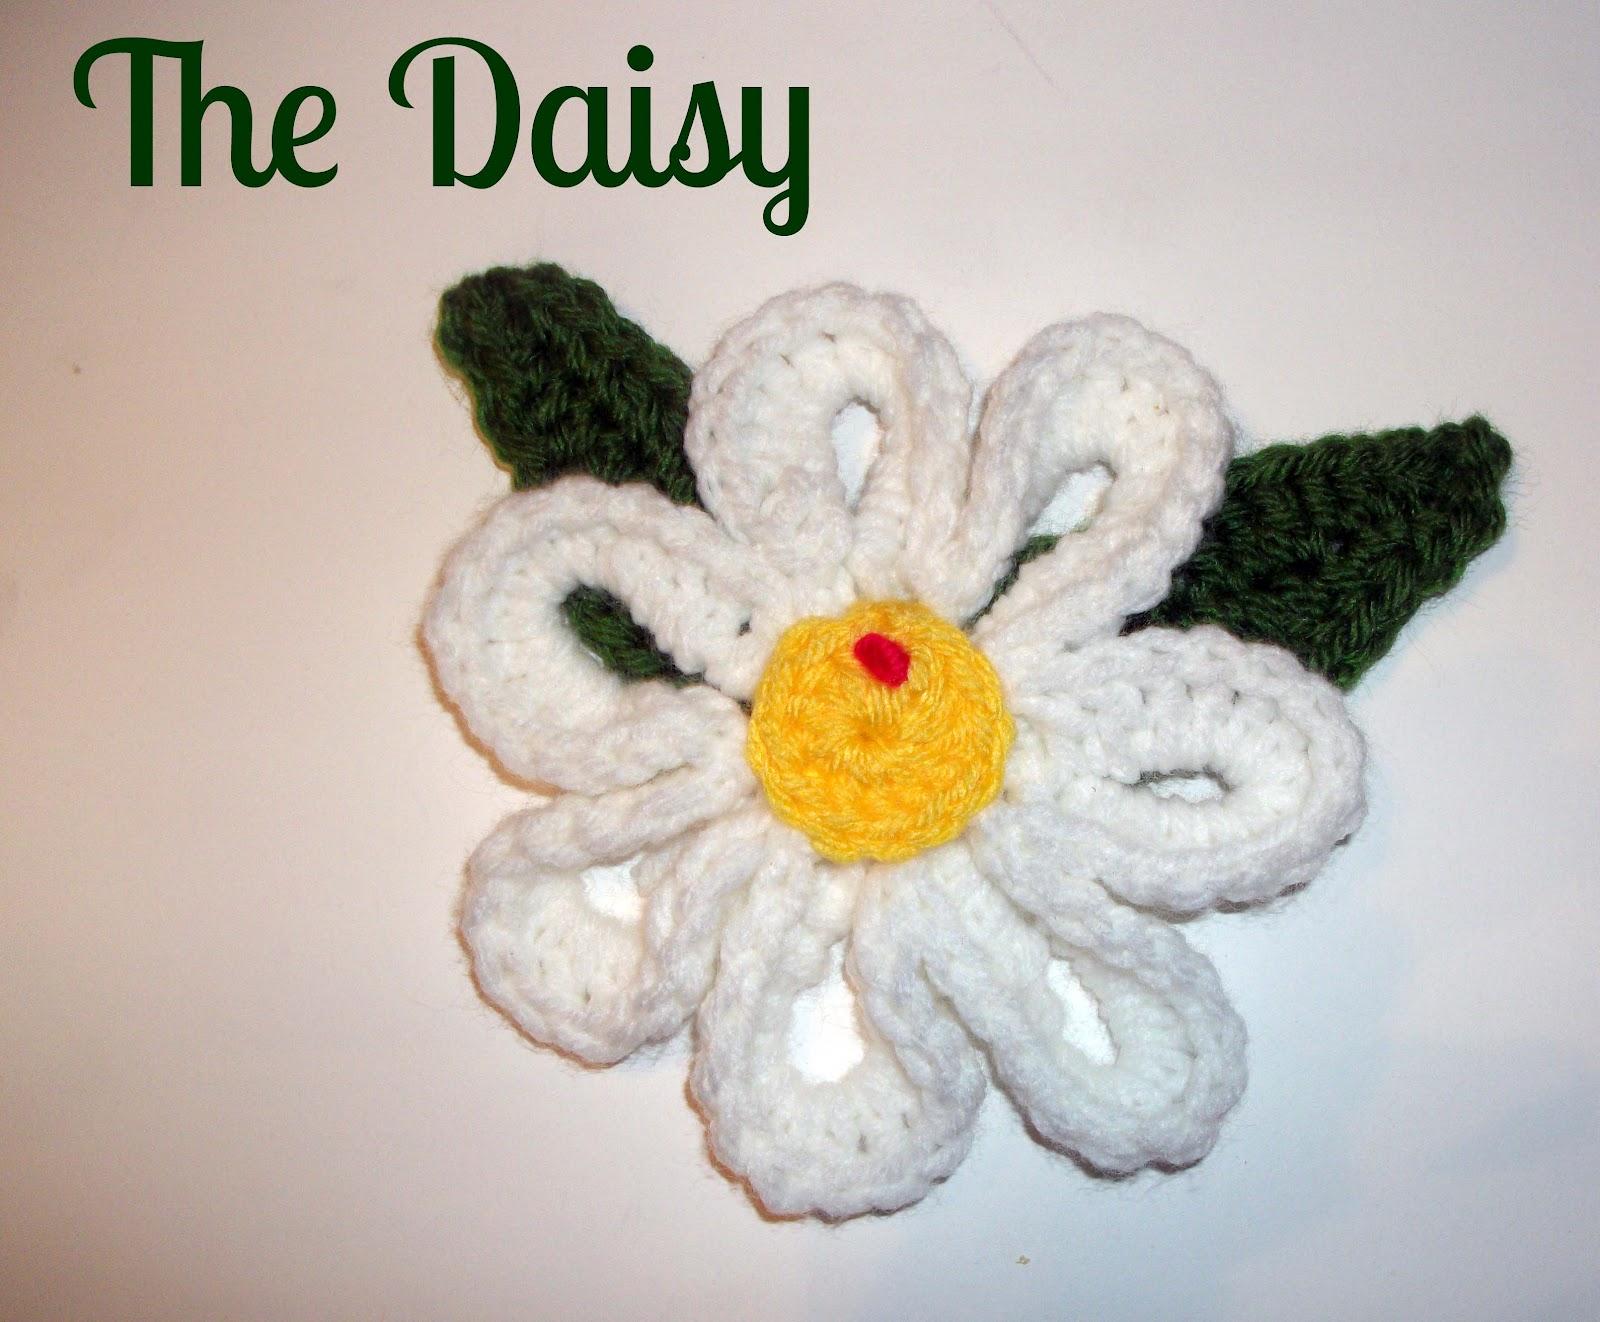 My big daisy crochet pattern melodycrochet my big daisy crochet pattern izmirmasajfo